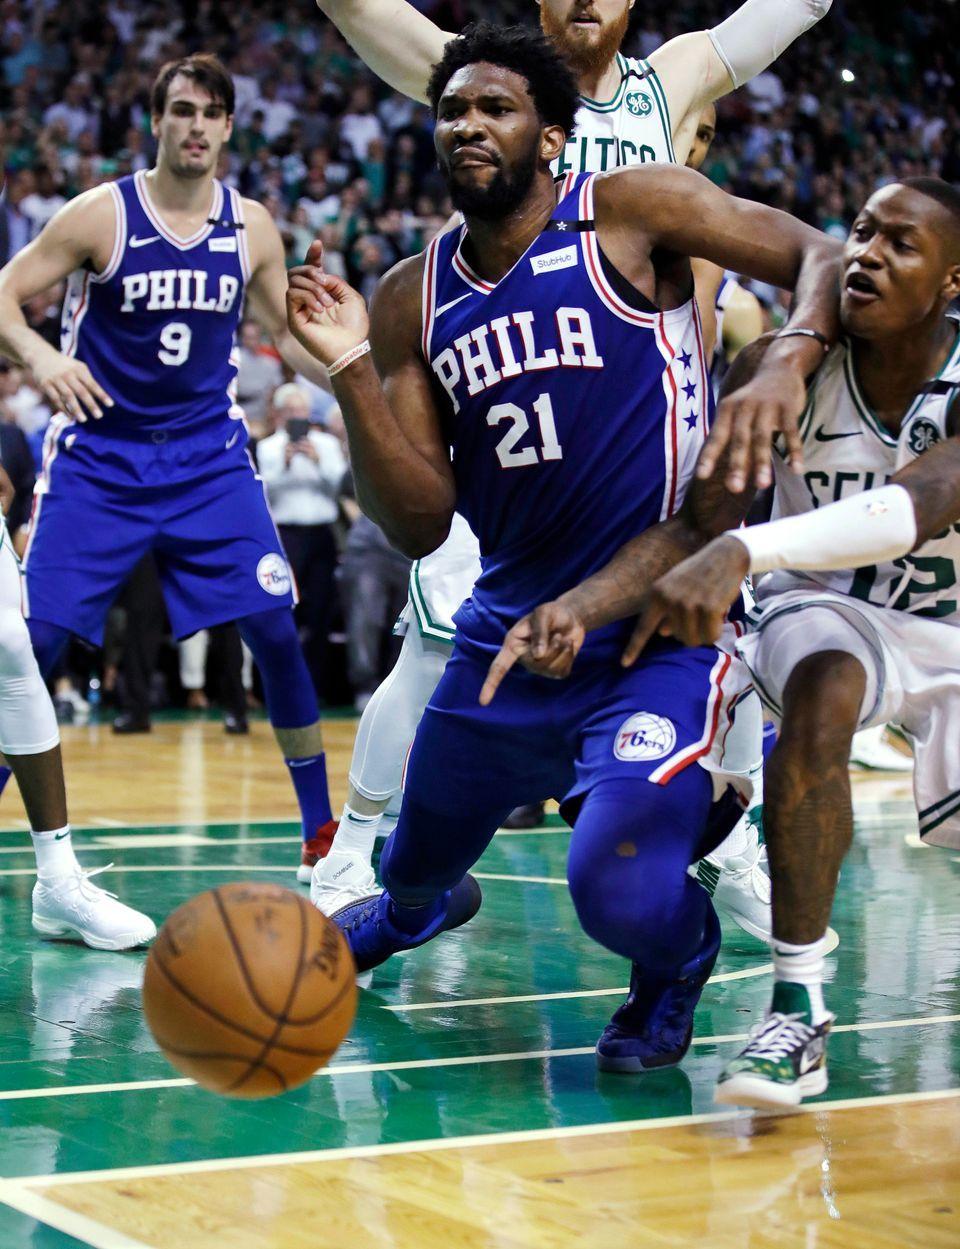 Pin by Lee Jones on Celtics Dream Closet Nba teams